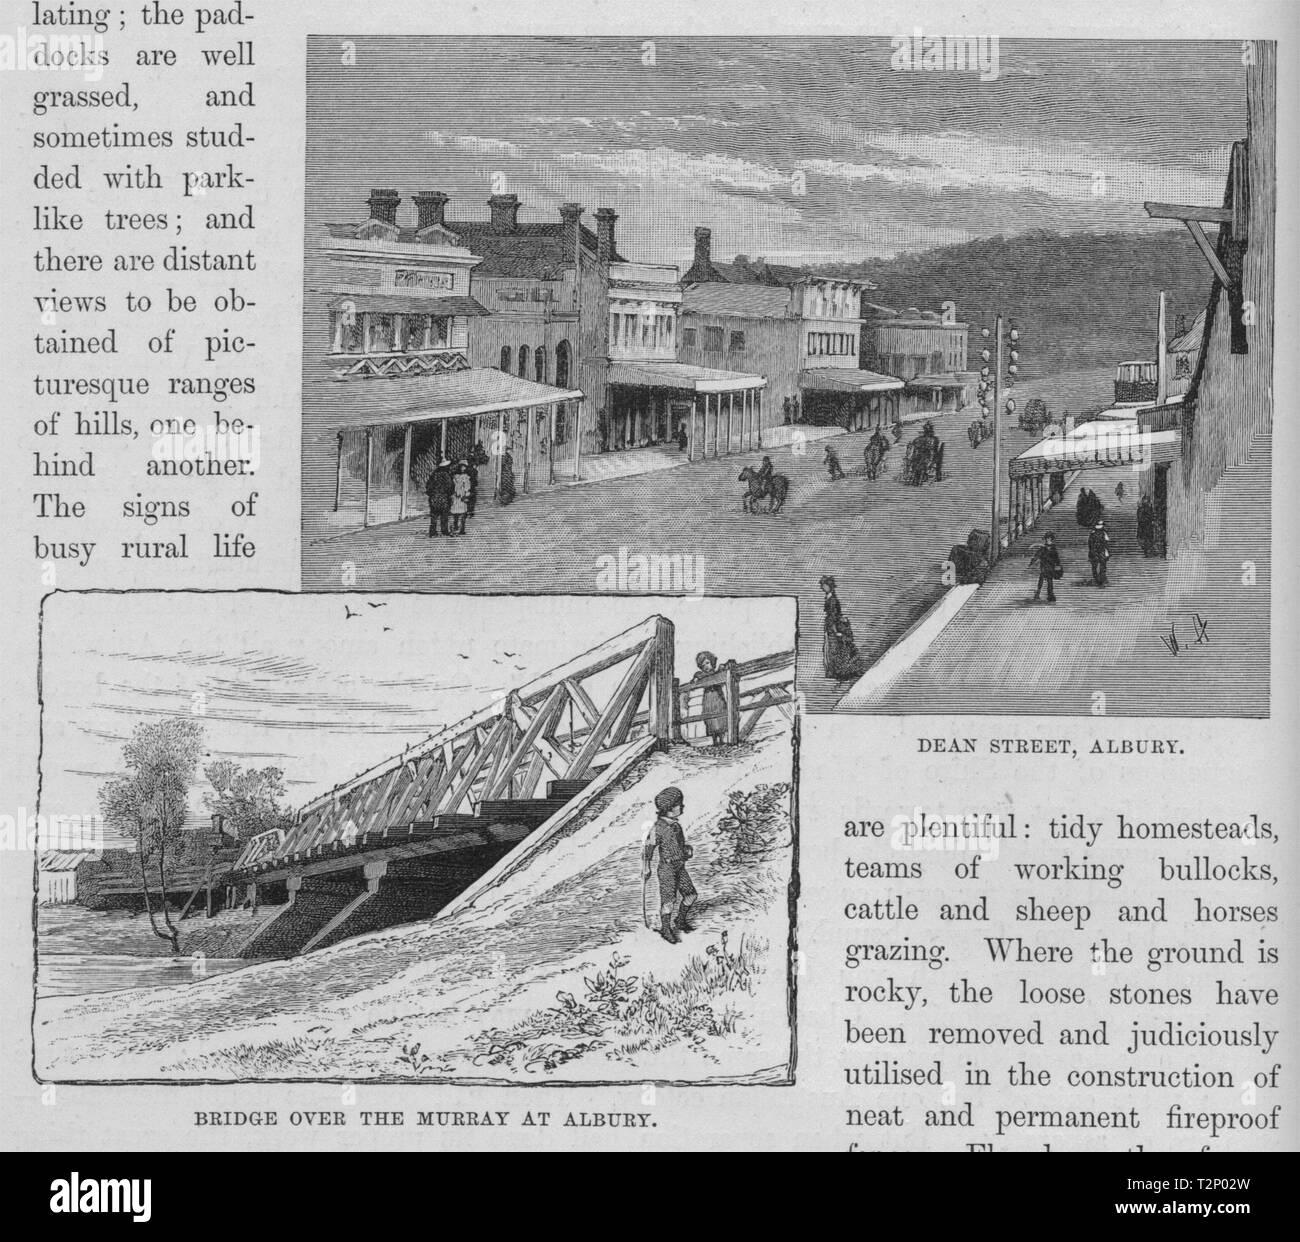 Bridge over the Murray at Albury and Dean Street, Albury. Australia 1890 print - Stock Image